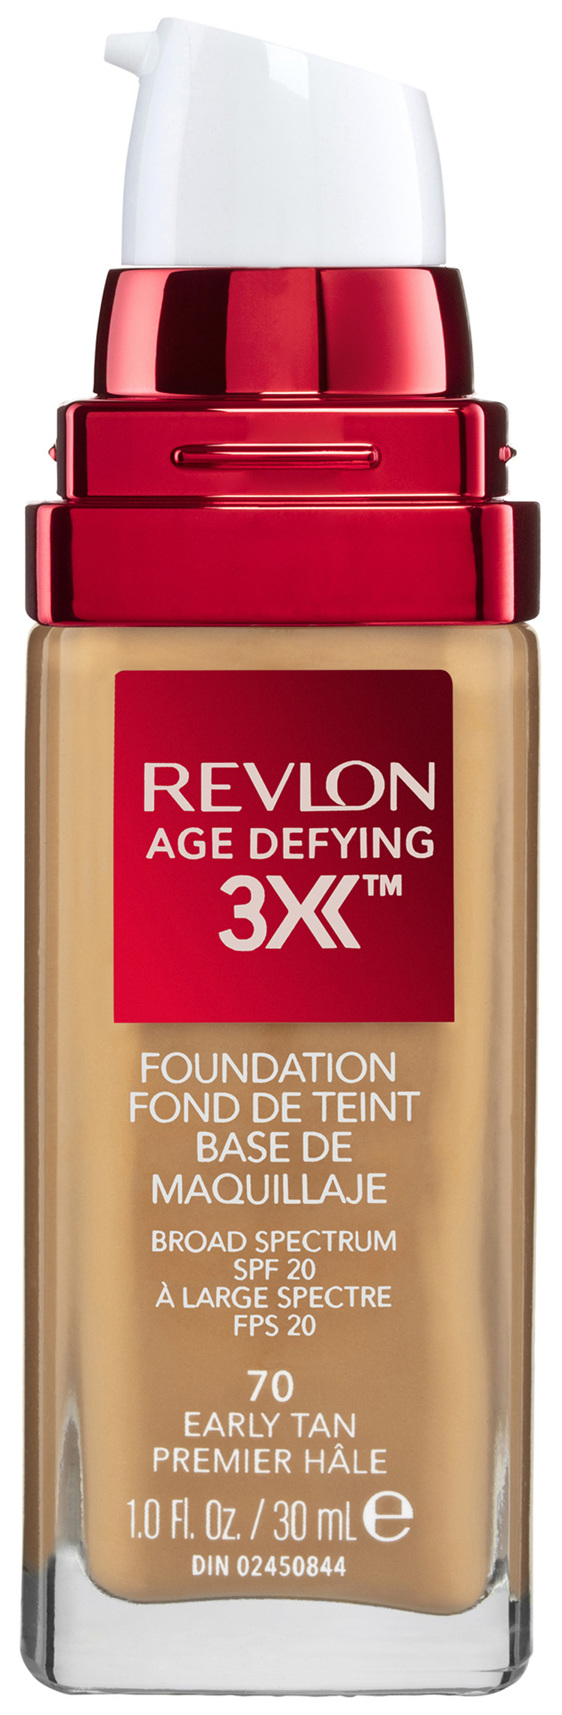 Revlon Age Defying™ 3X Foundation Early Tan